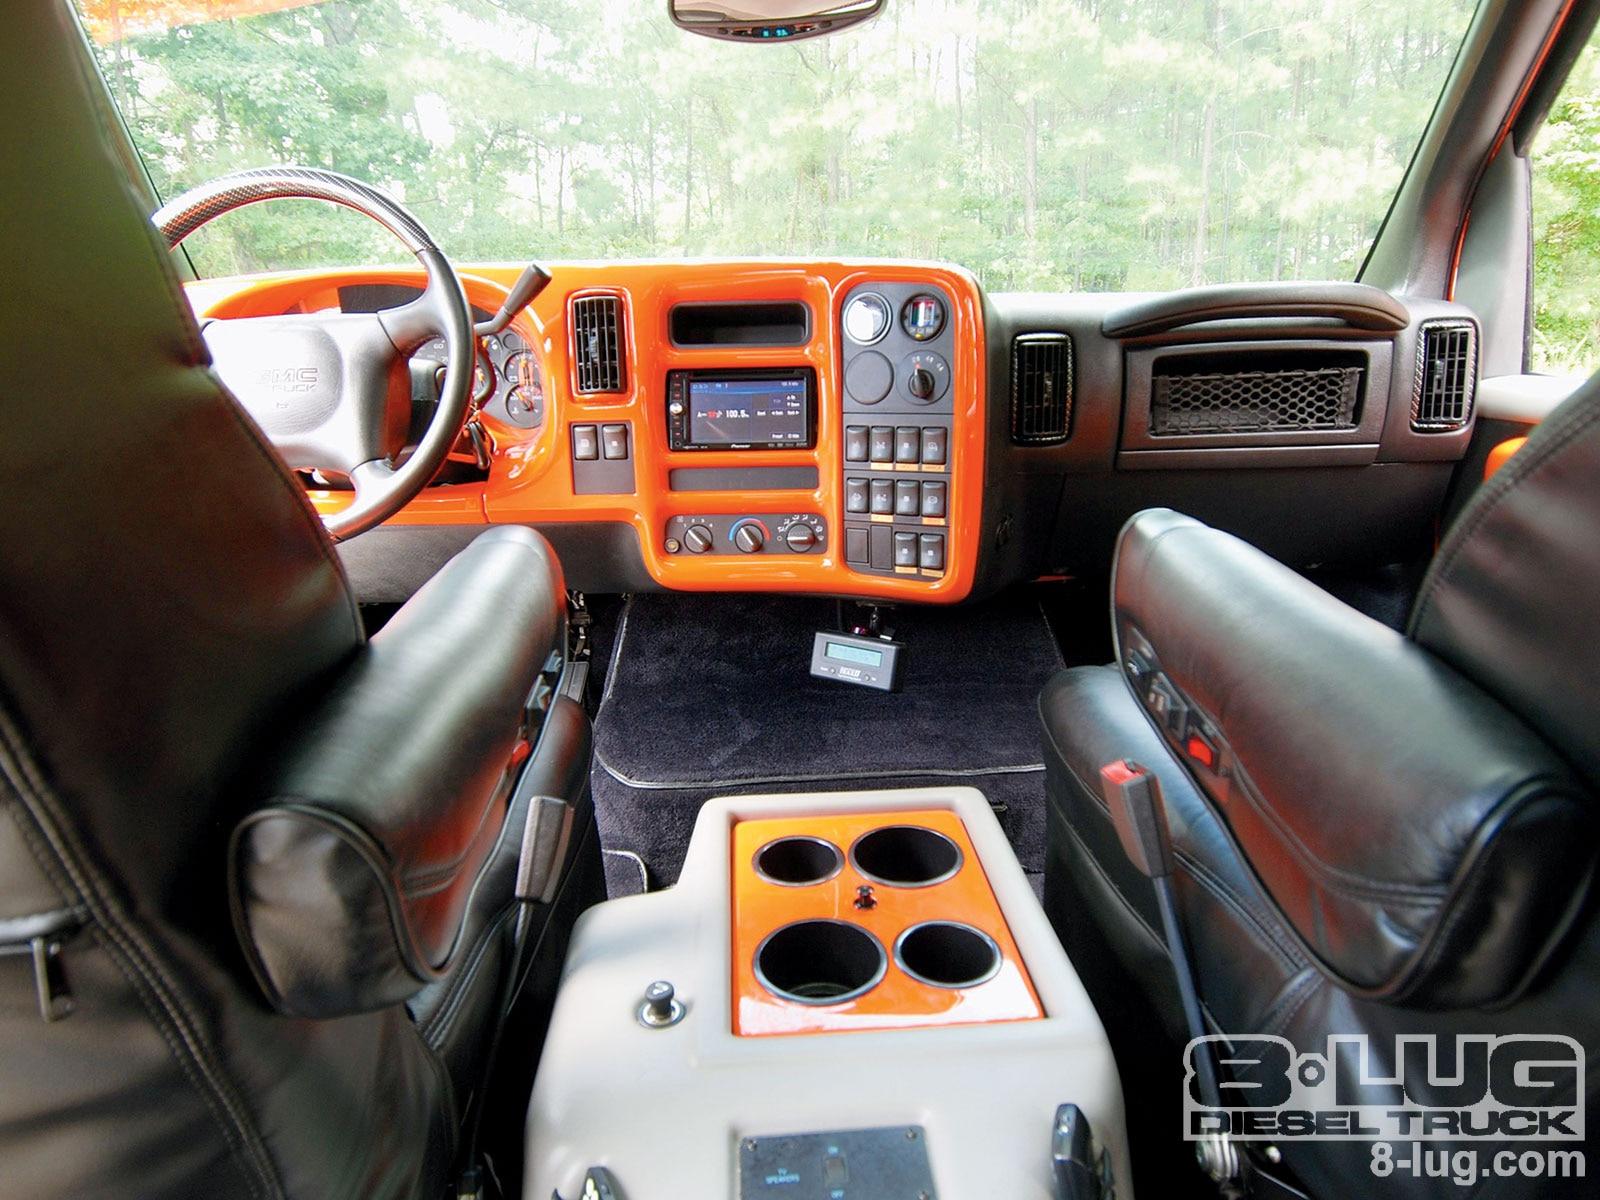 2008 Gmc Topkick 4500 Gm S Ultimate Bad Boy Pickup Photo Image